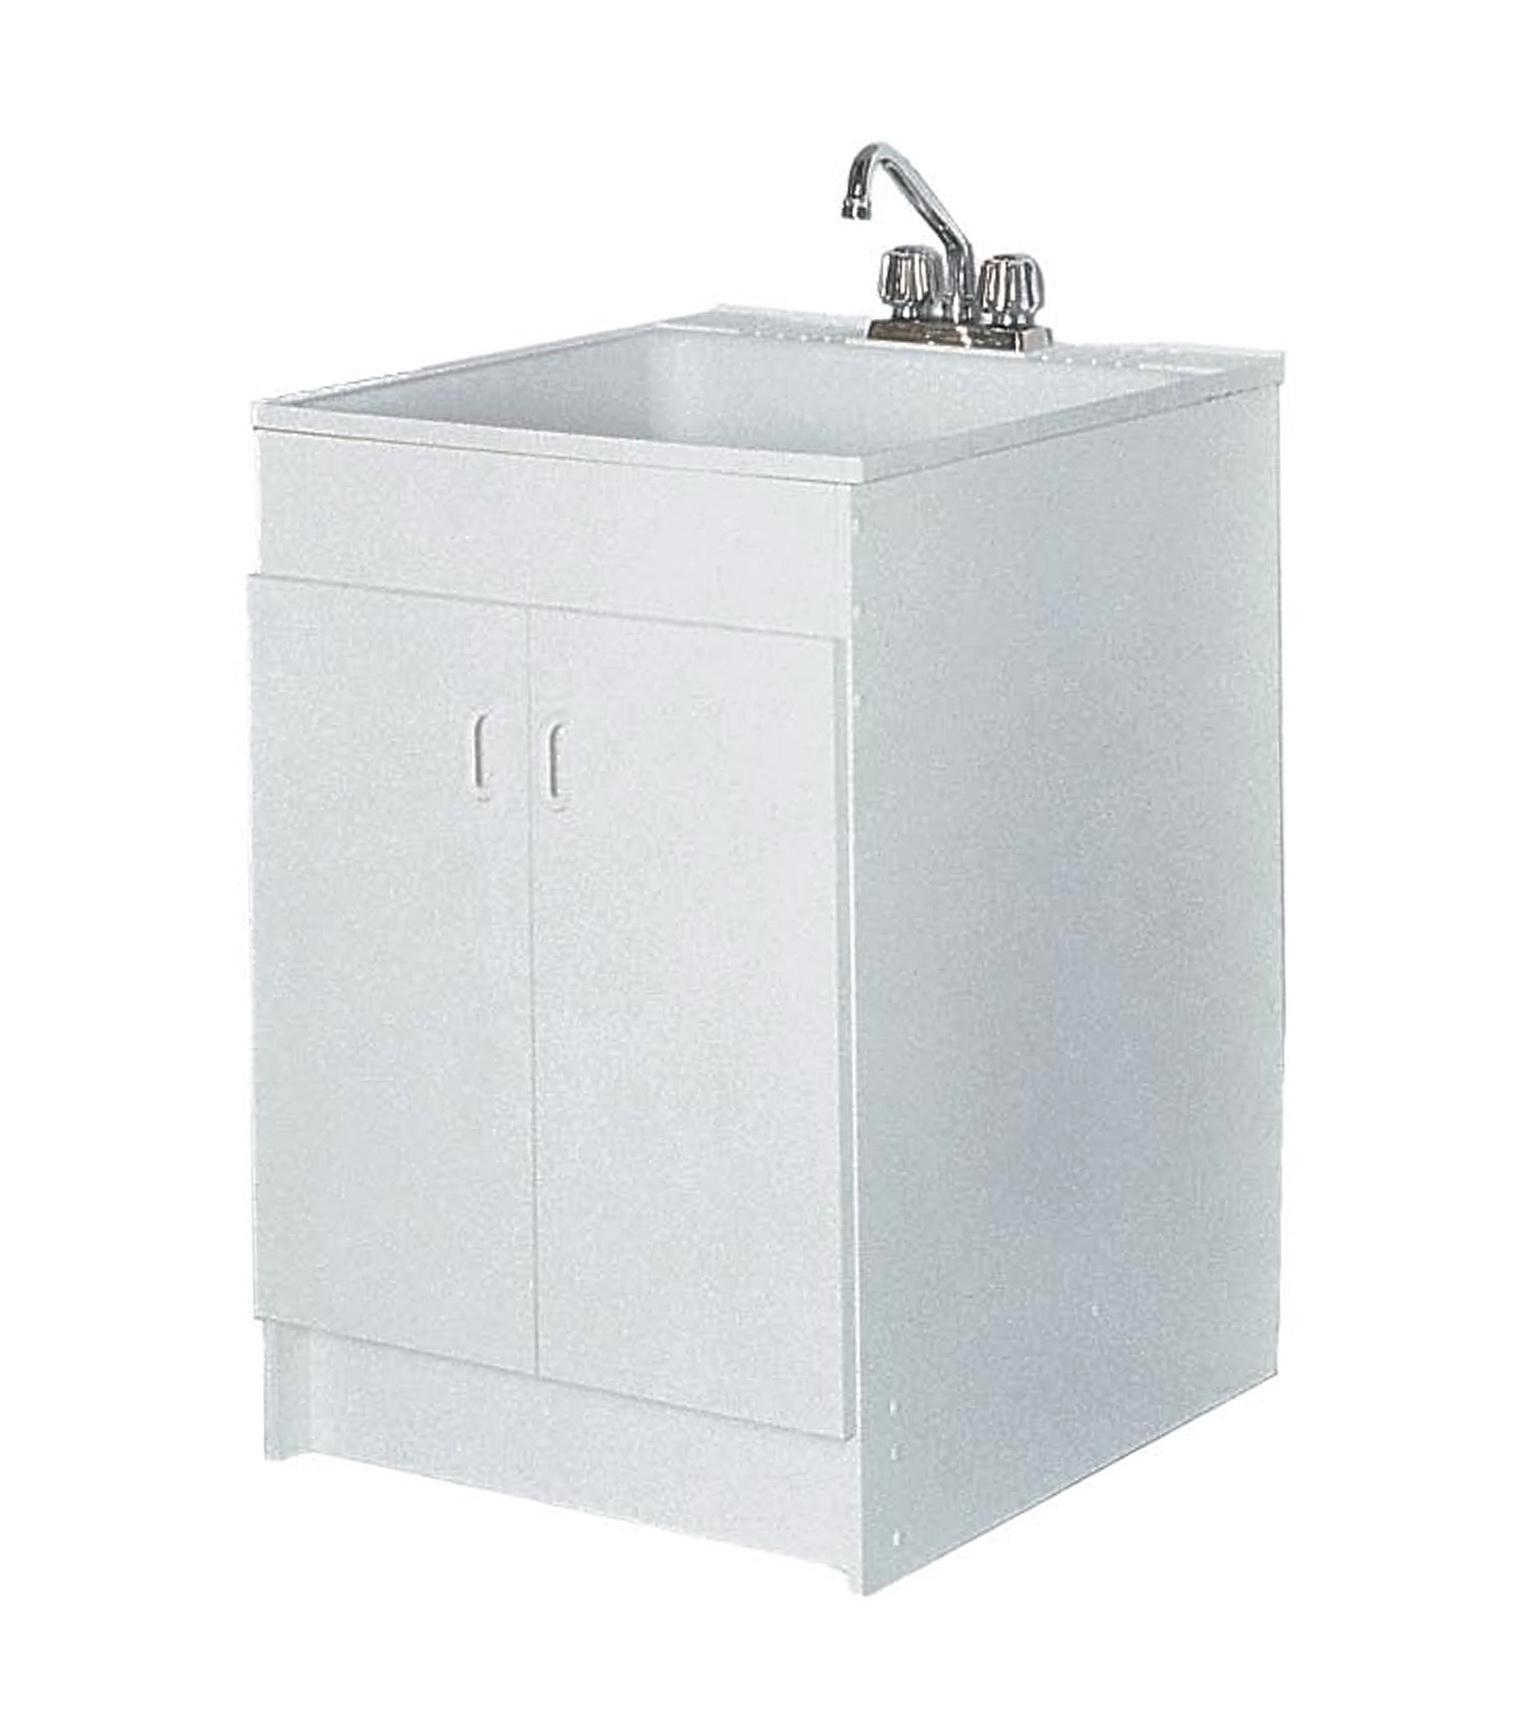 Deep Laundry Sink Cabinet